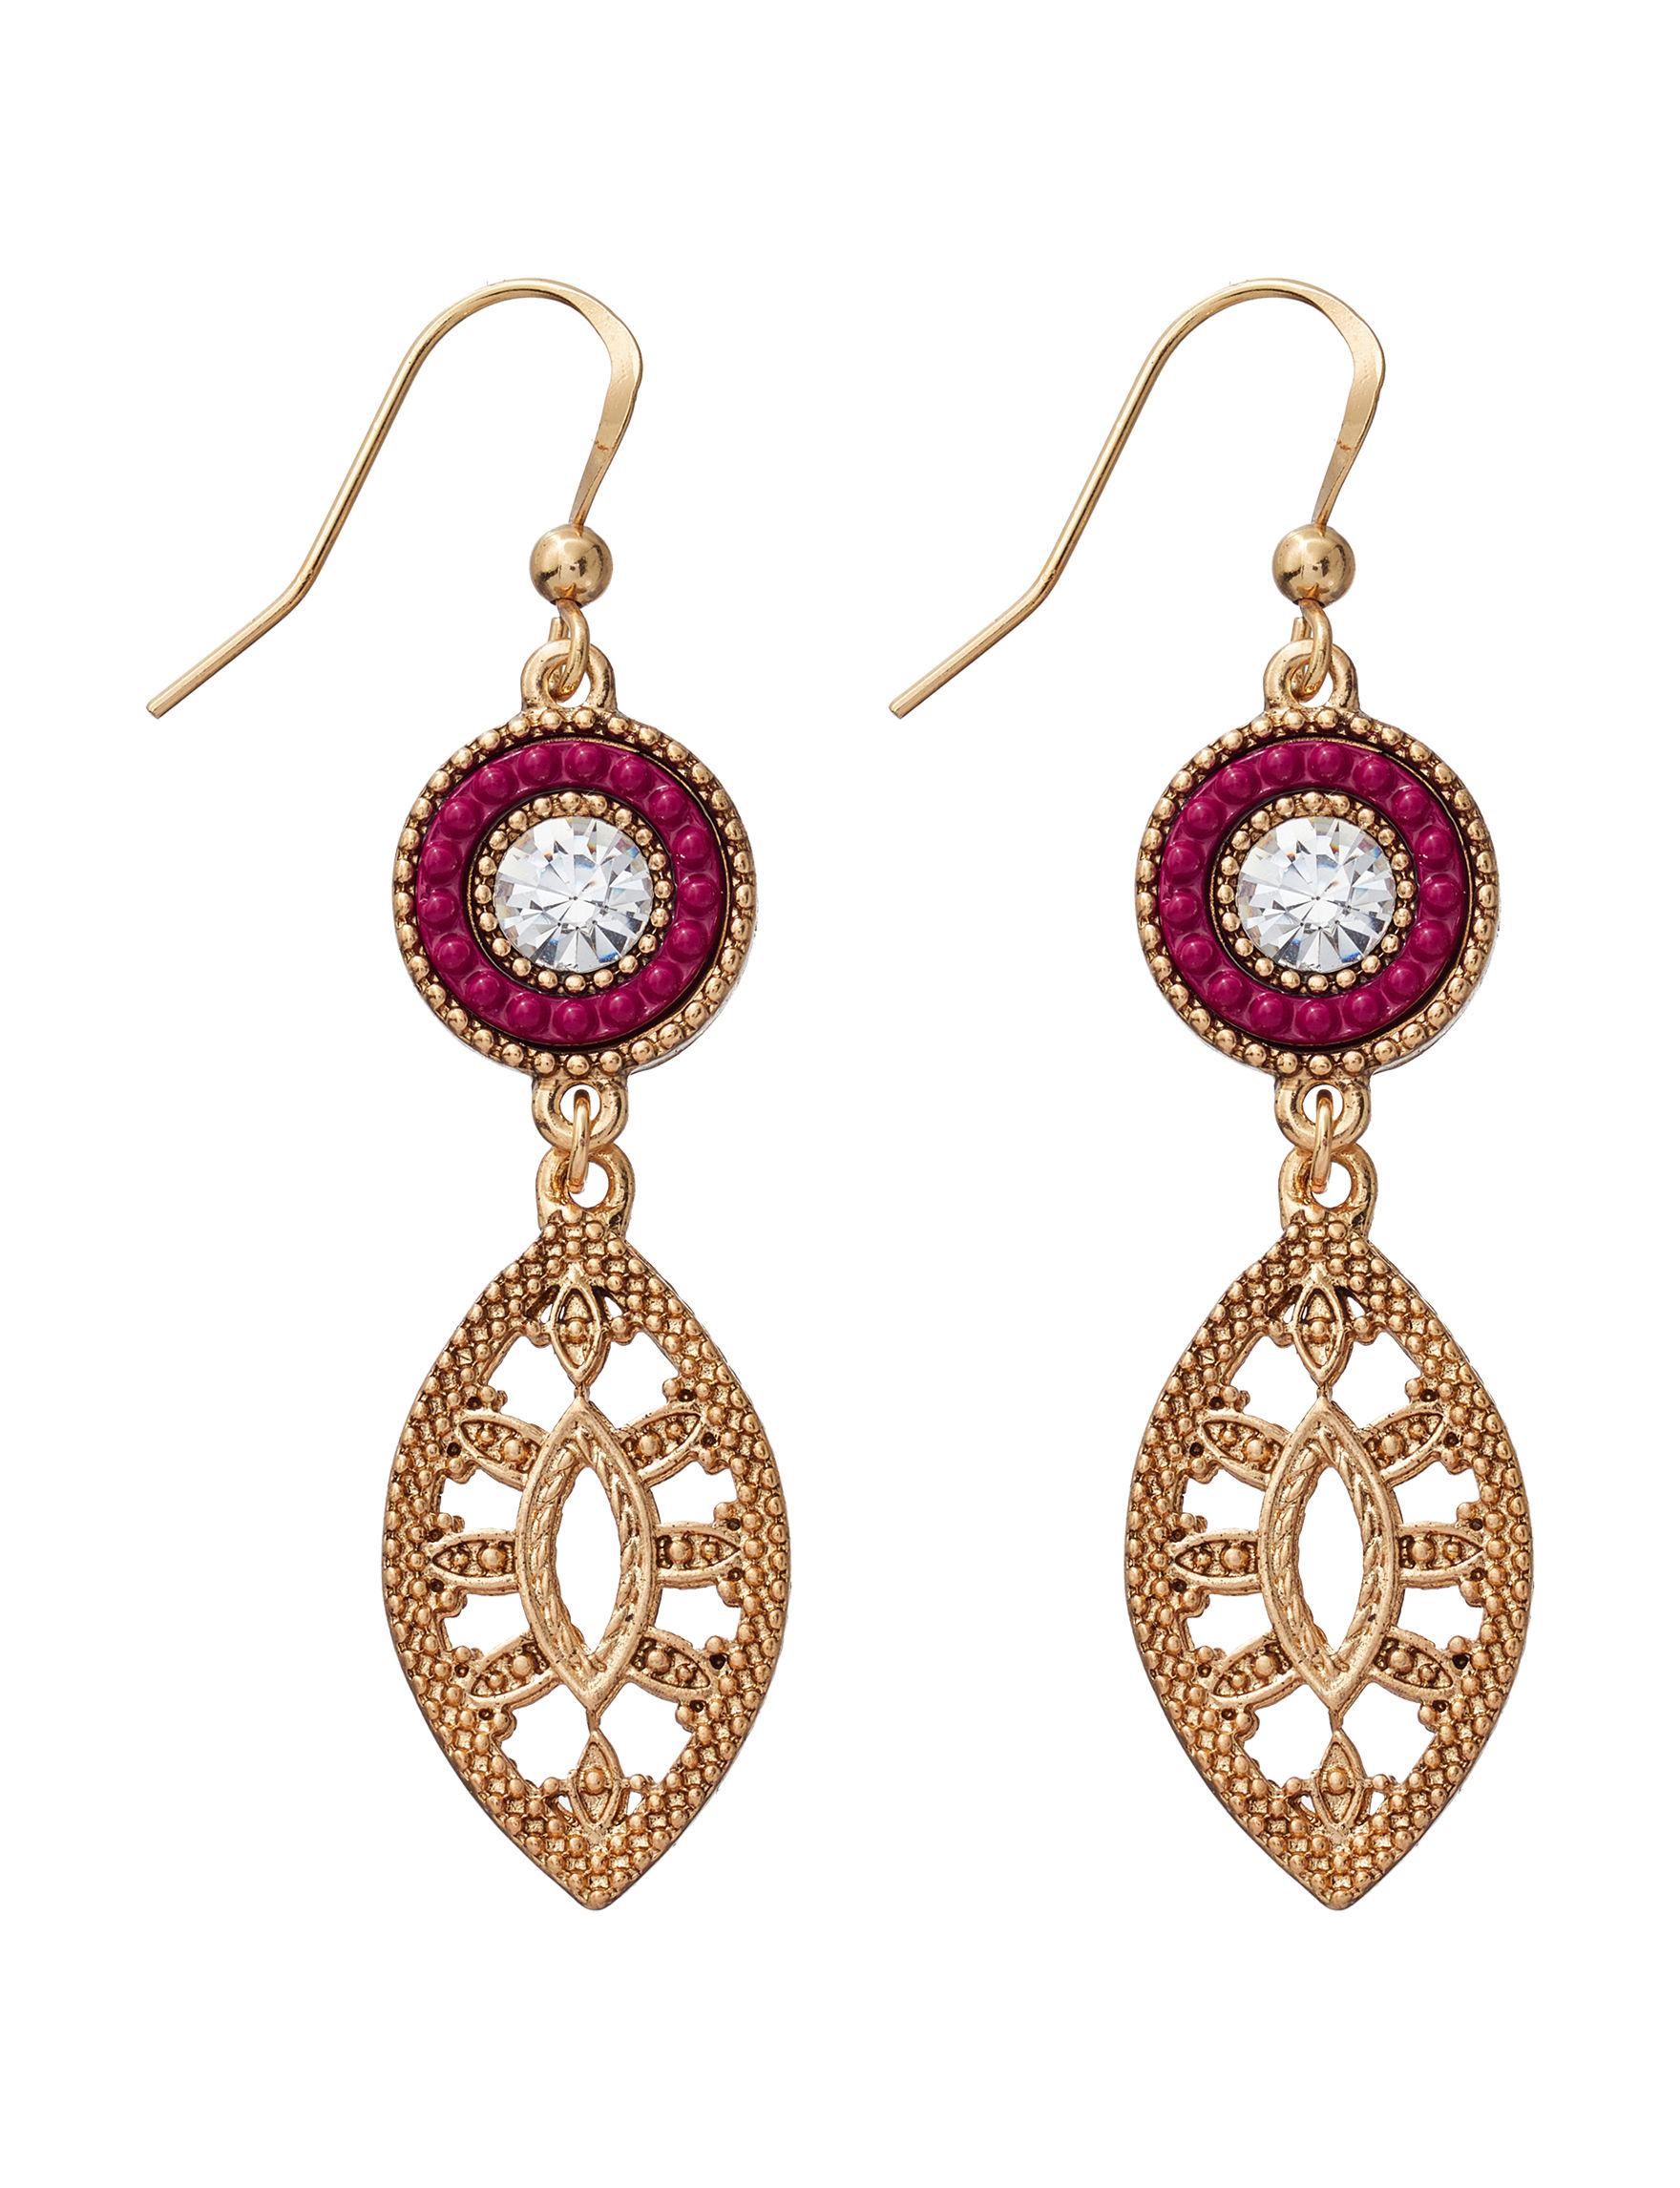 Hannah Marcasite Drops Earrings Fashion Jewelry